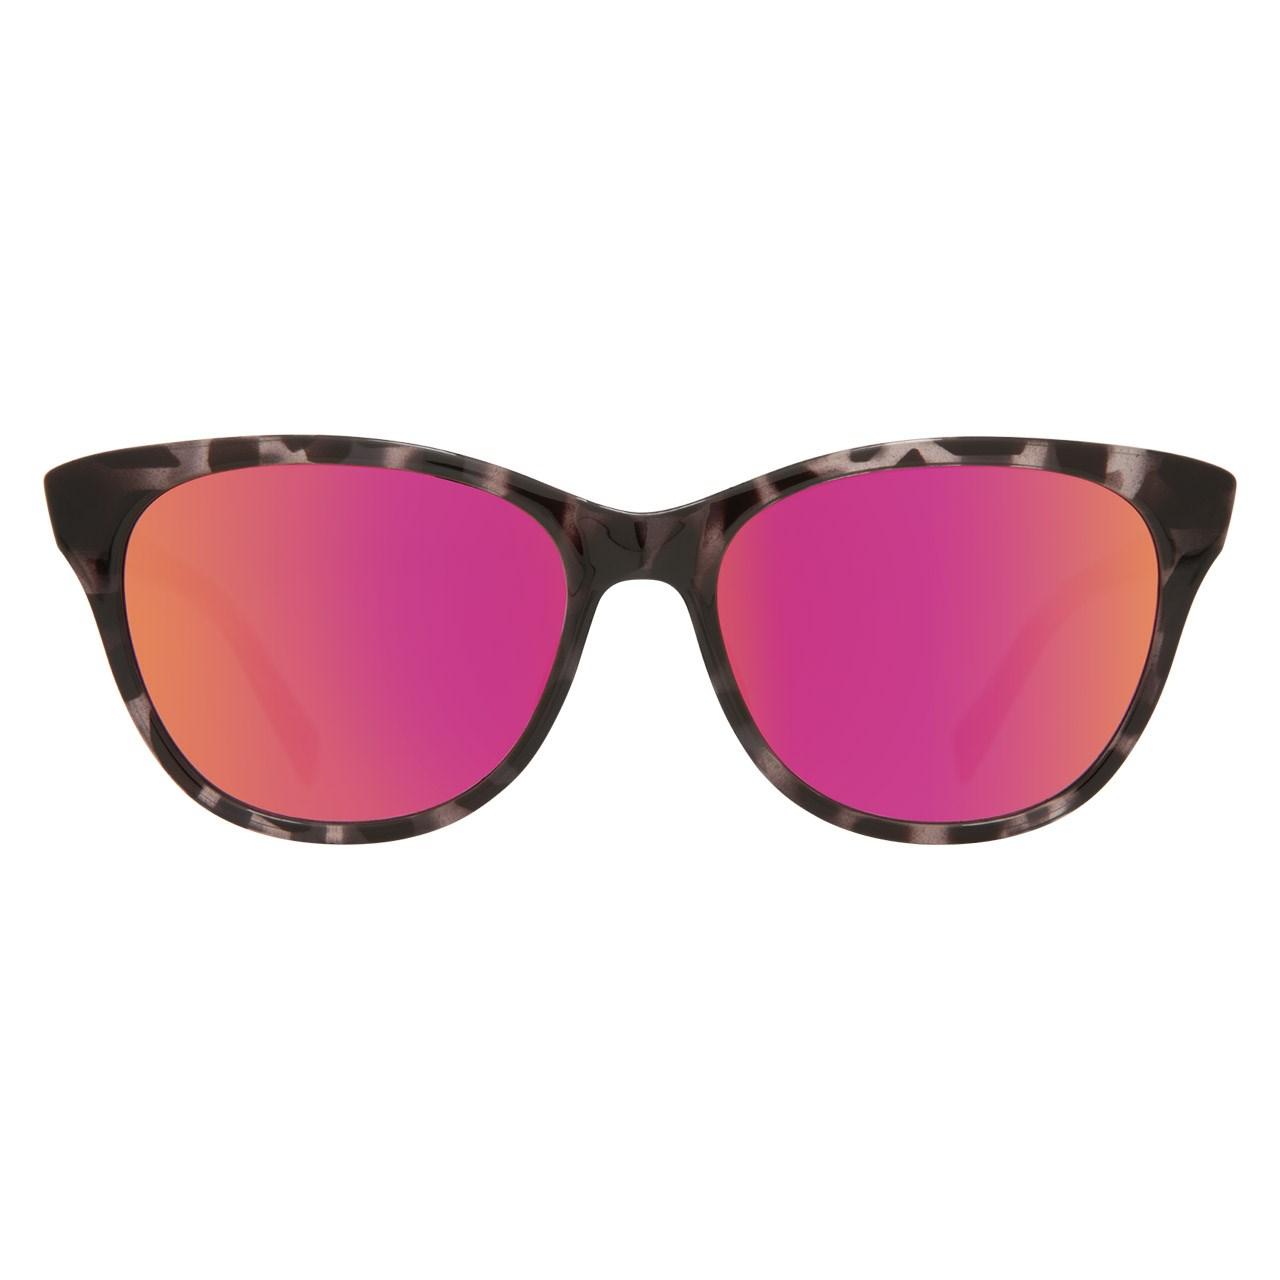 عینک آفتابی اسپای سری Spritzer مدل Black Tort/Pink Spectra